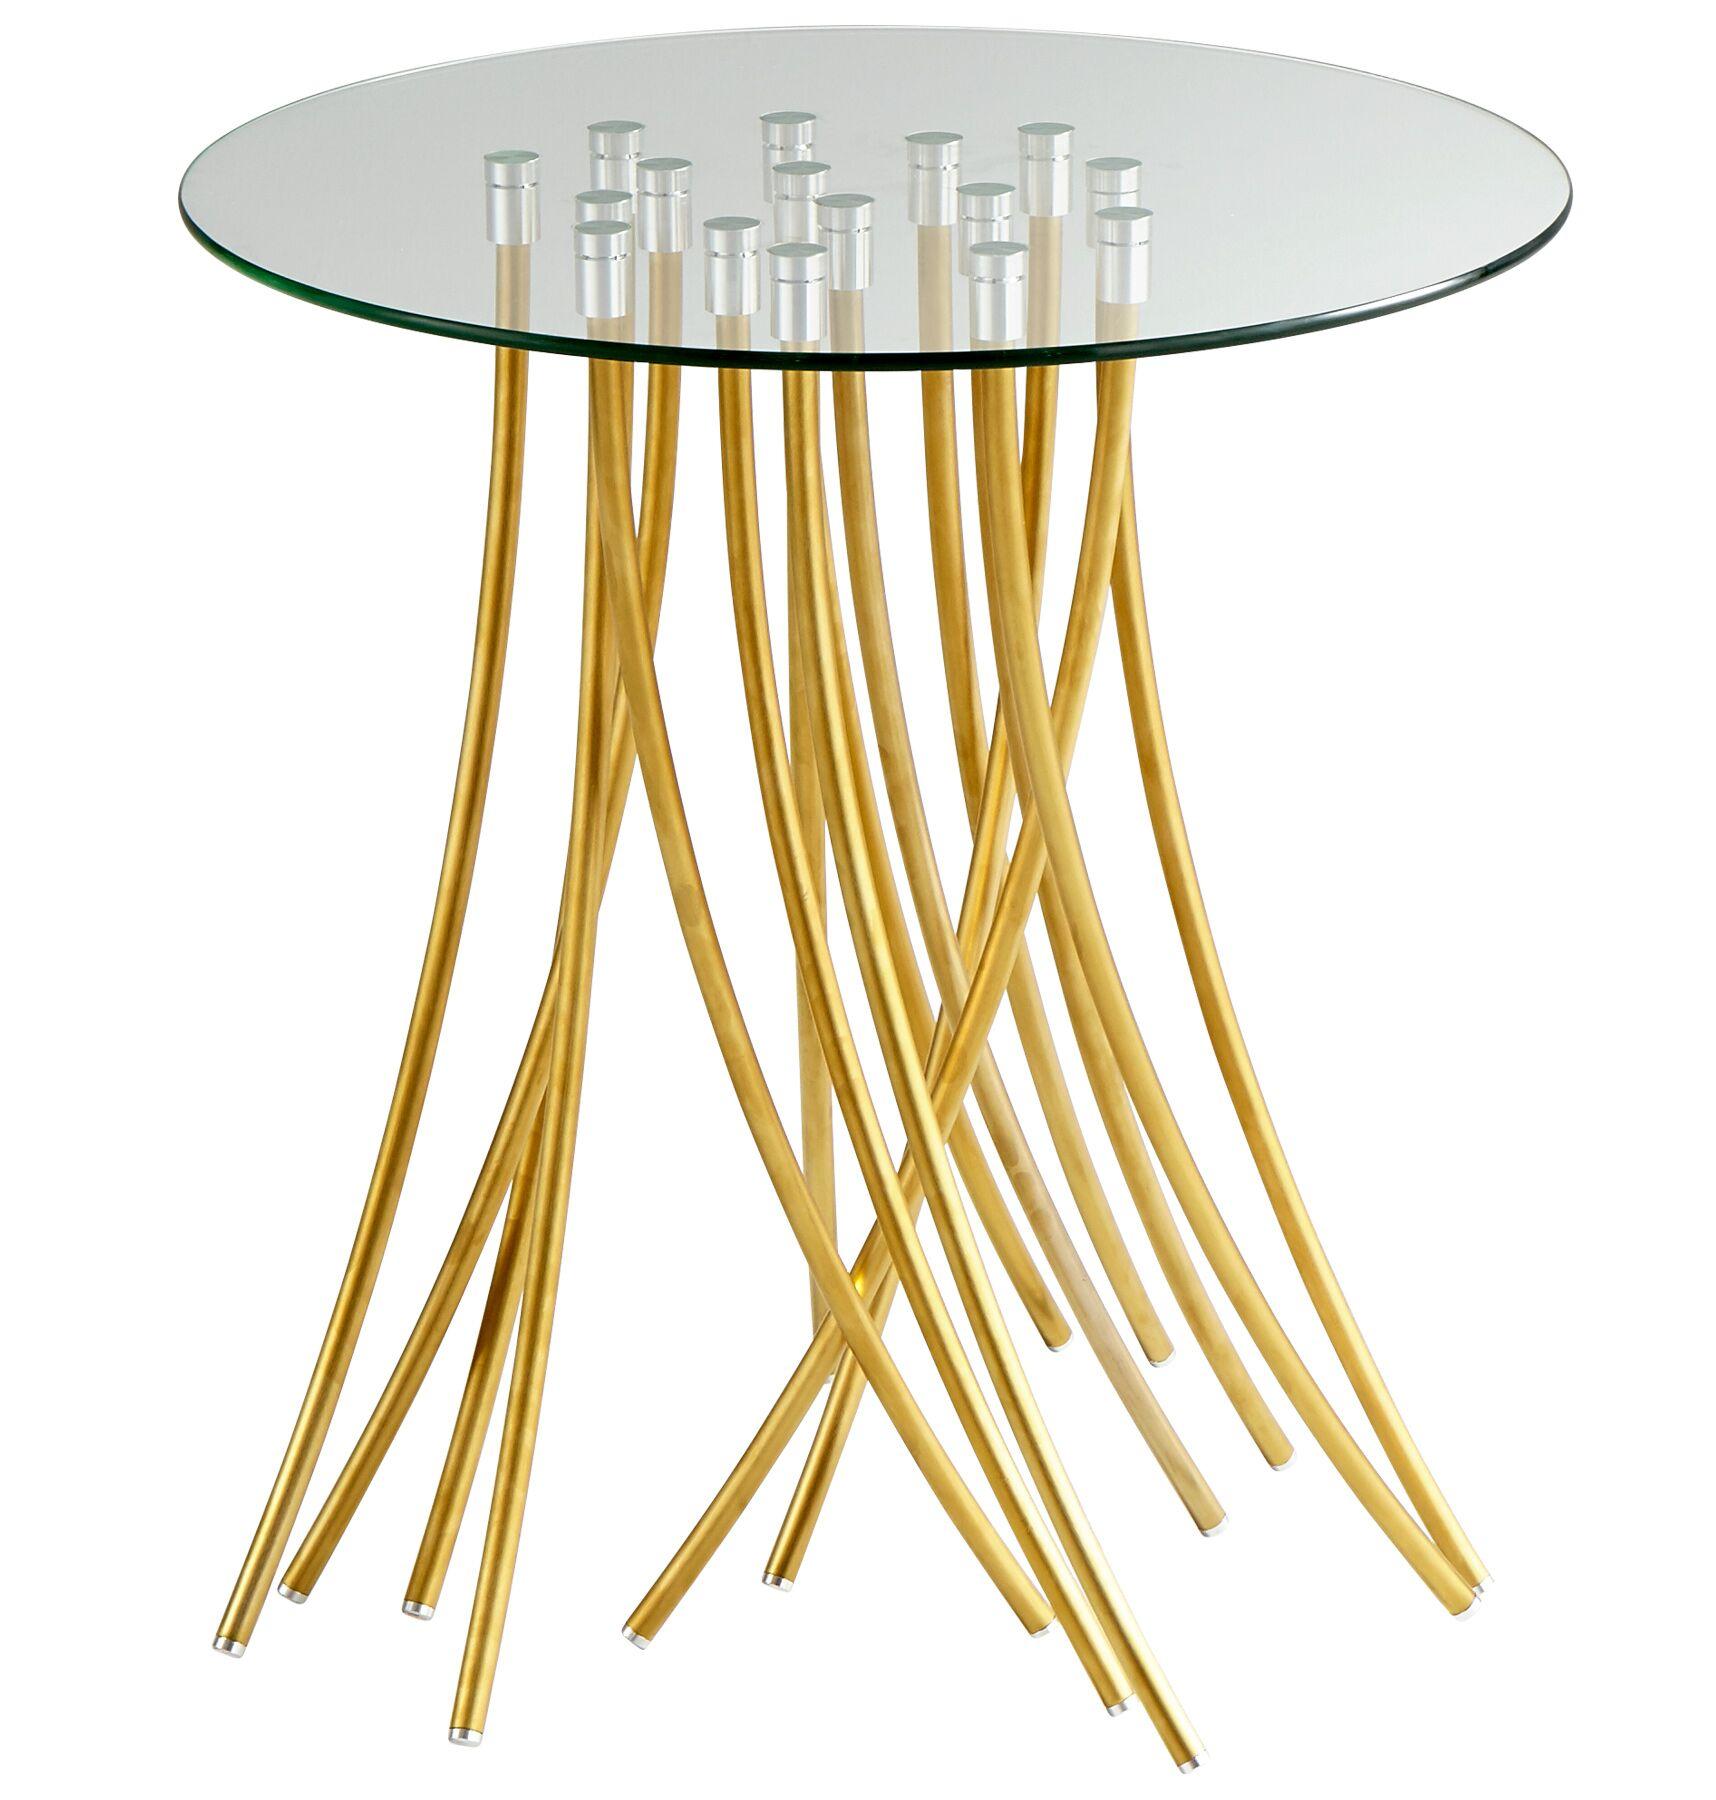 Tuffoli End Table